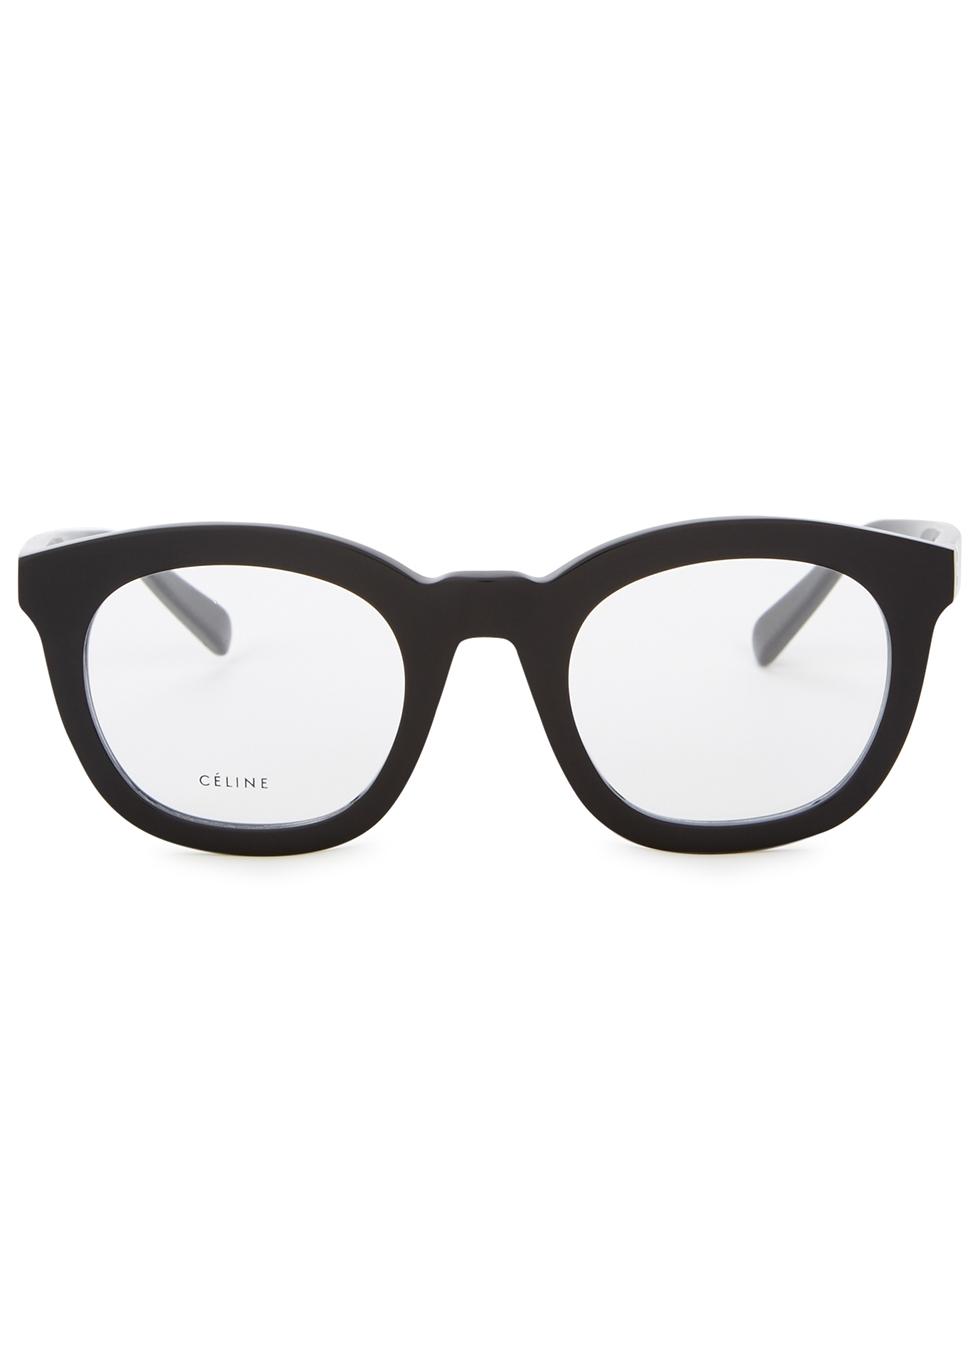 05f25593361d Black wayfarer style optical glasses black wayfarer style optical glasses  céline jpg 591x827 Celine reading glasses